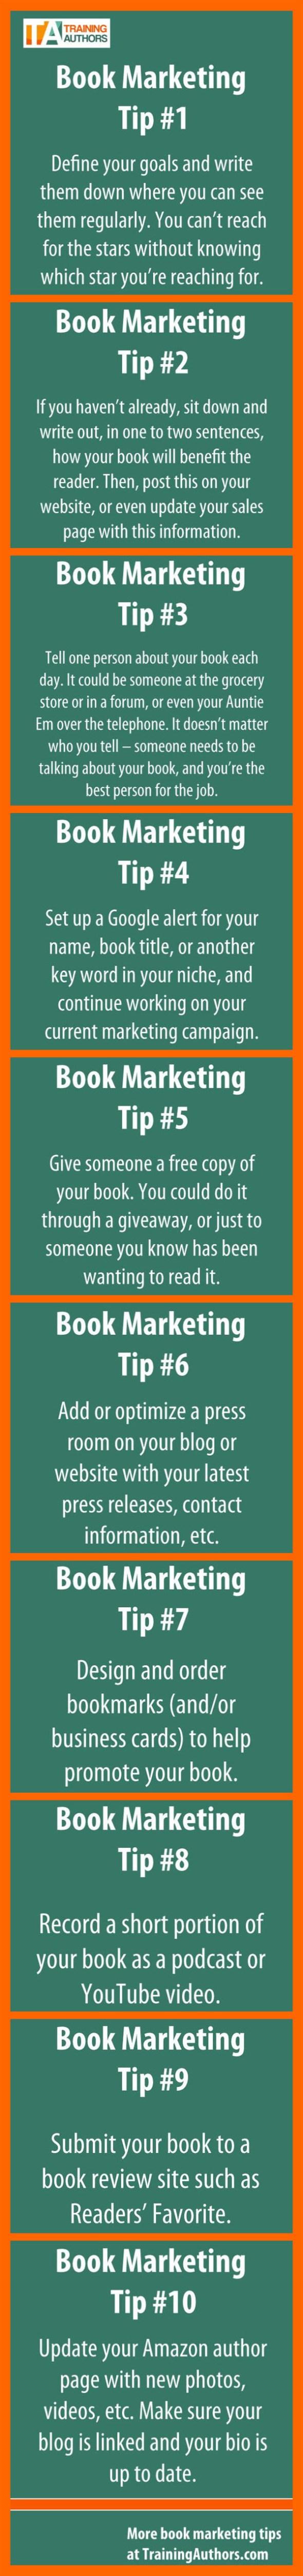 10 Book Marketing Tips